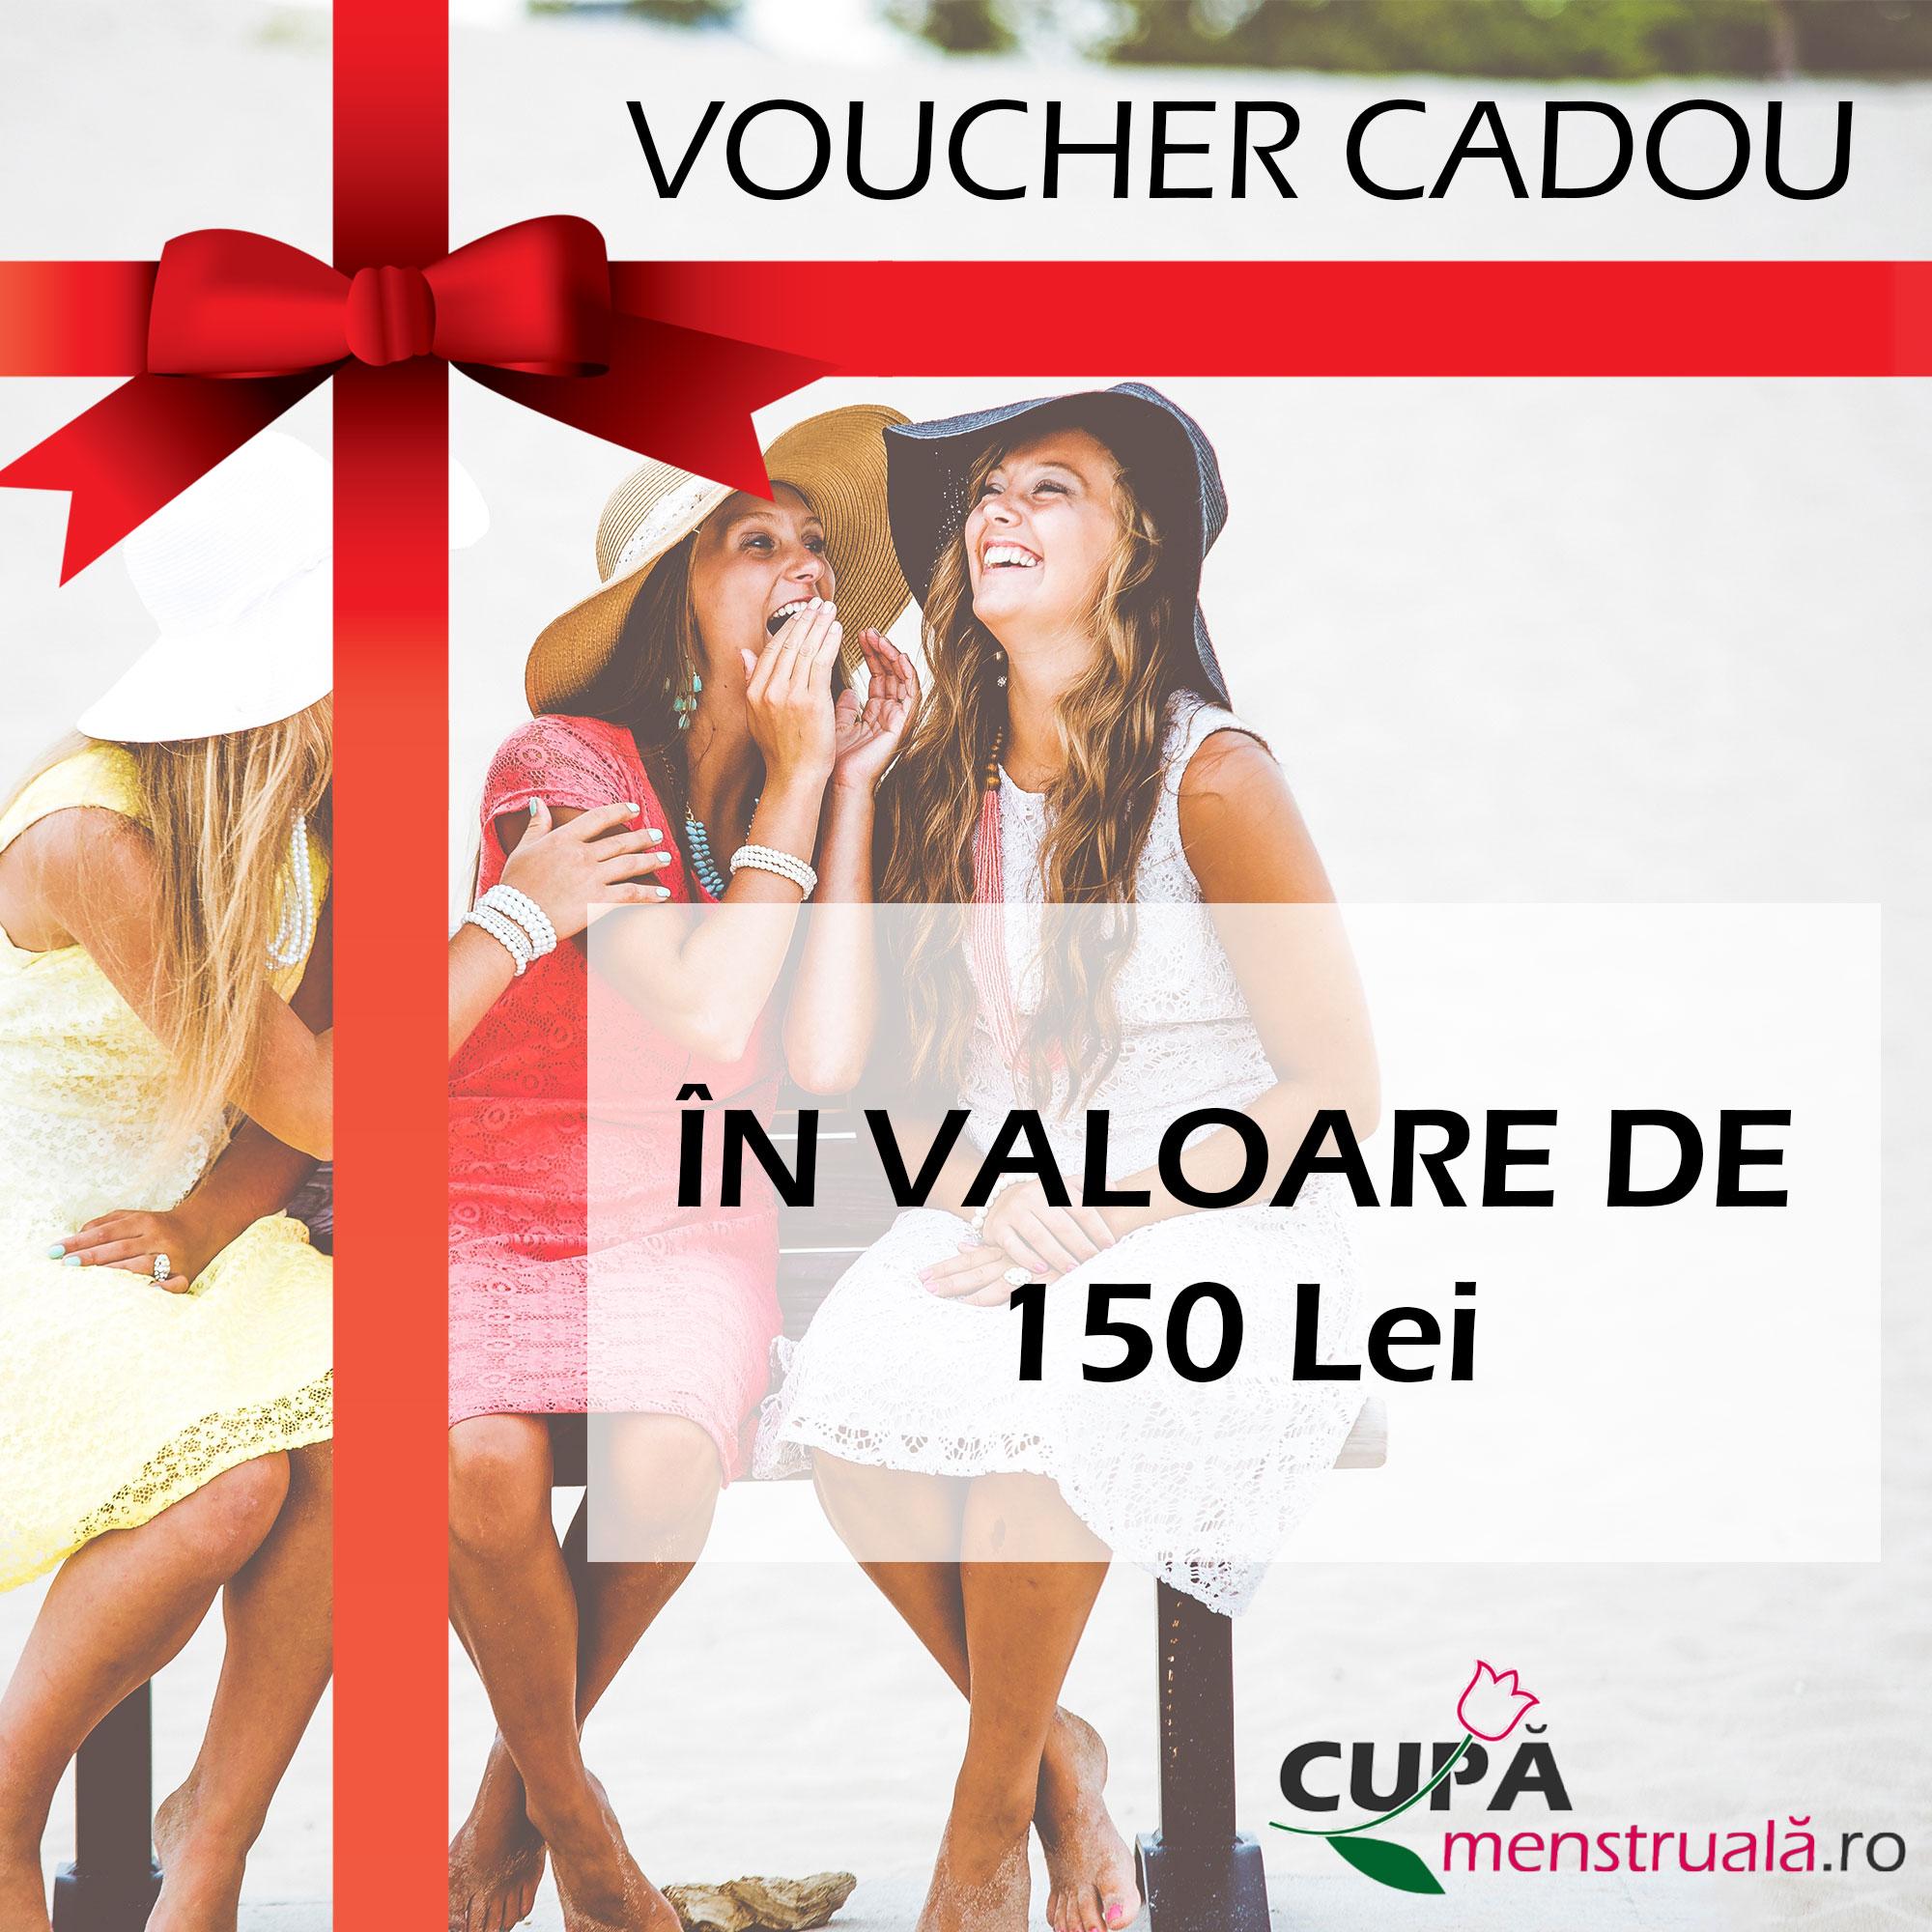 Voucher Cadou 150lei Cupa-Menstruala.ro